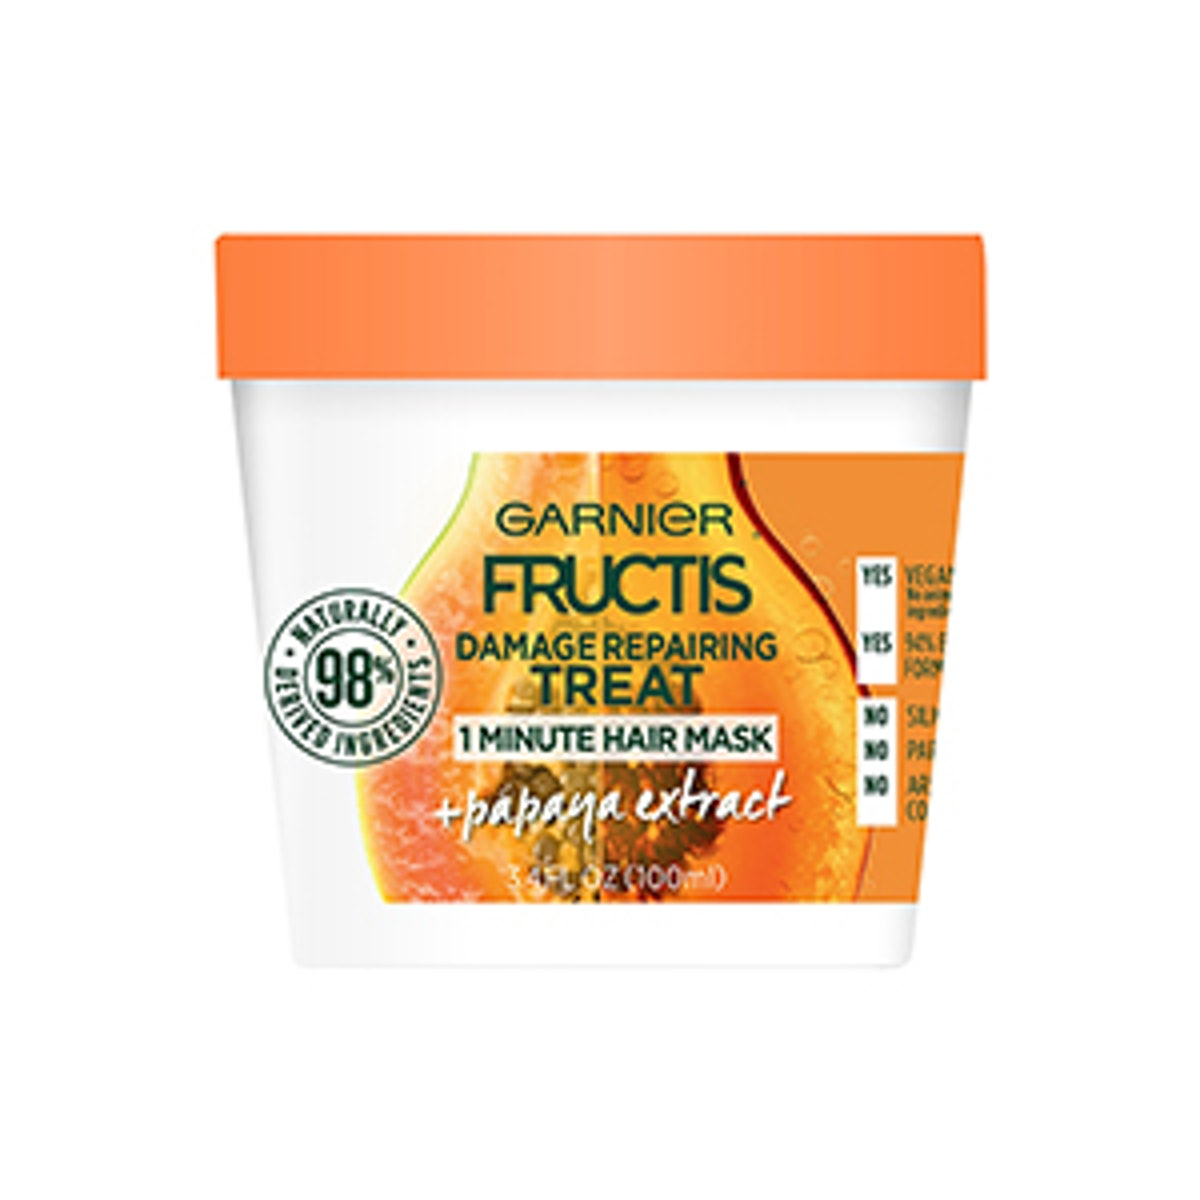 Garnier Fructis Smoothing Treat 1 Minute Hair Mask in Papaya Extract